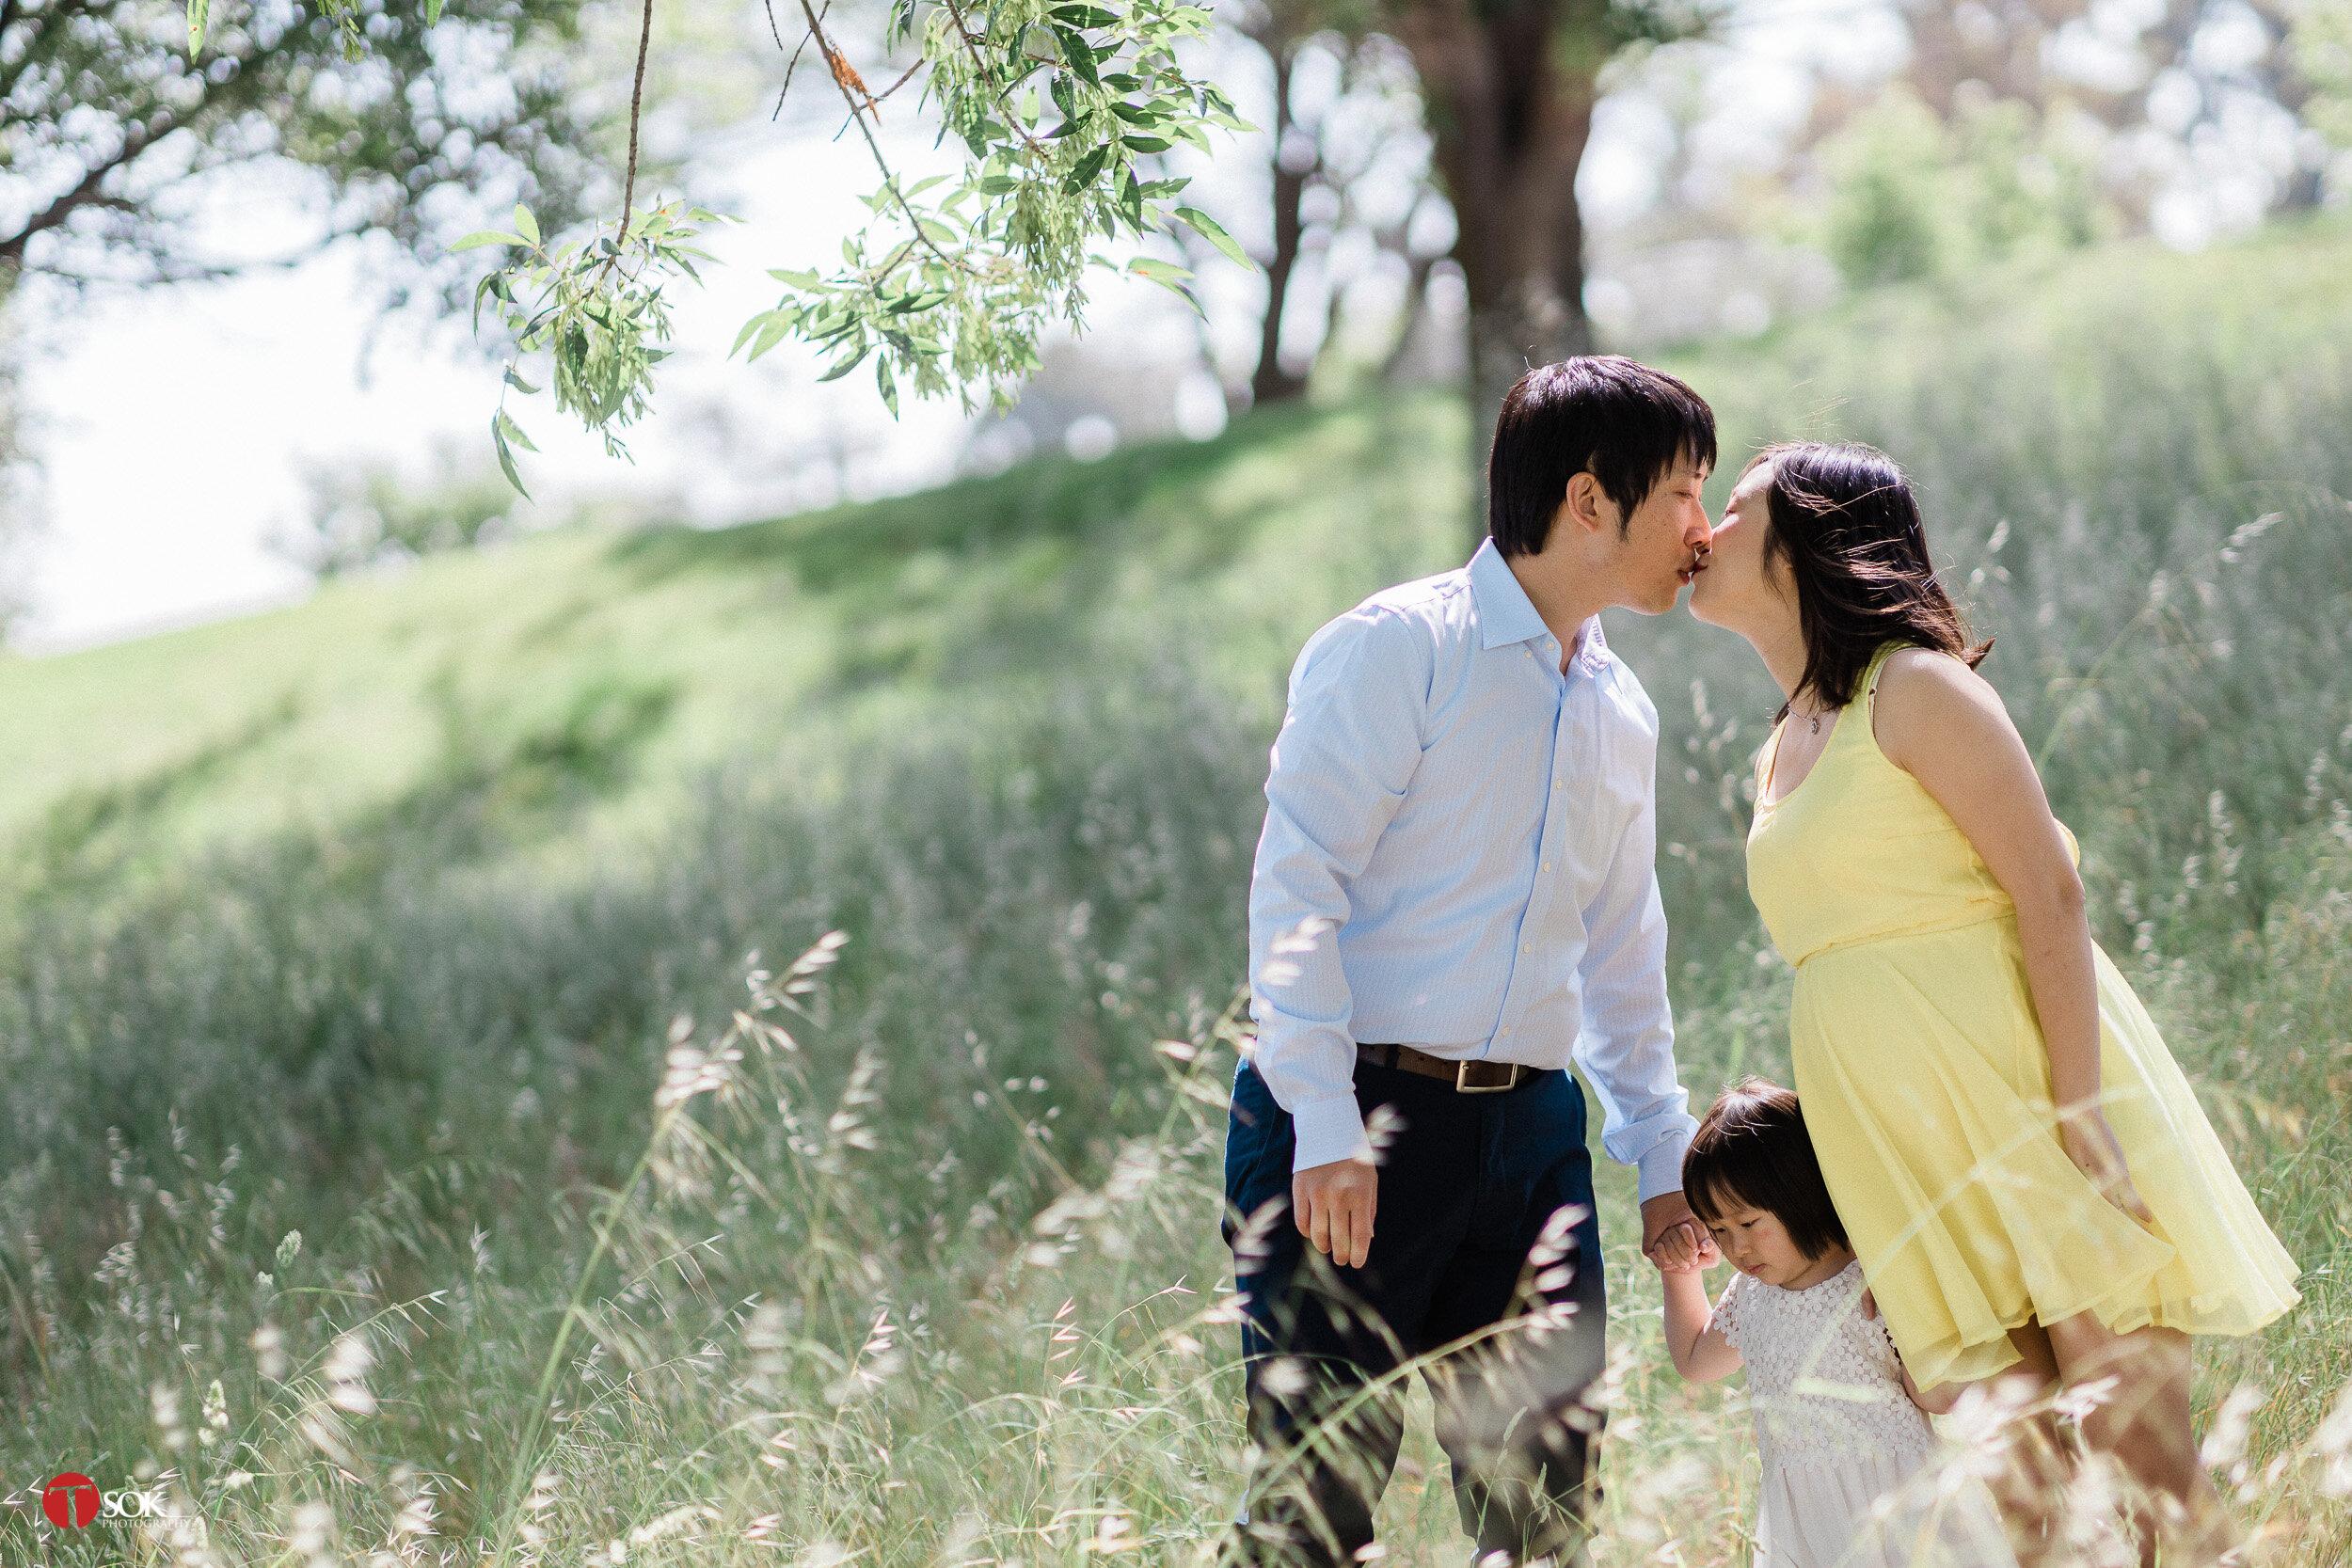 20190504_0009_yuen_maternity_baylands_park.jpg